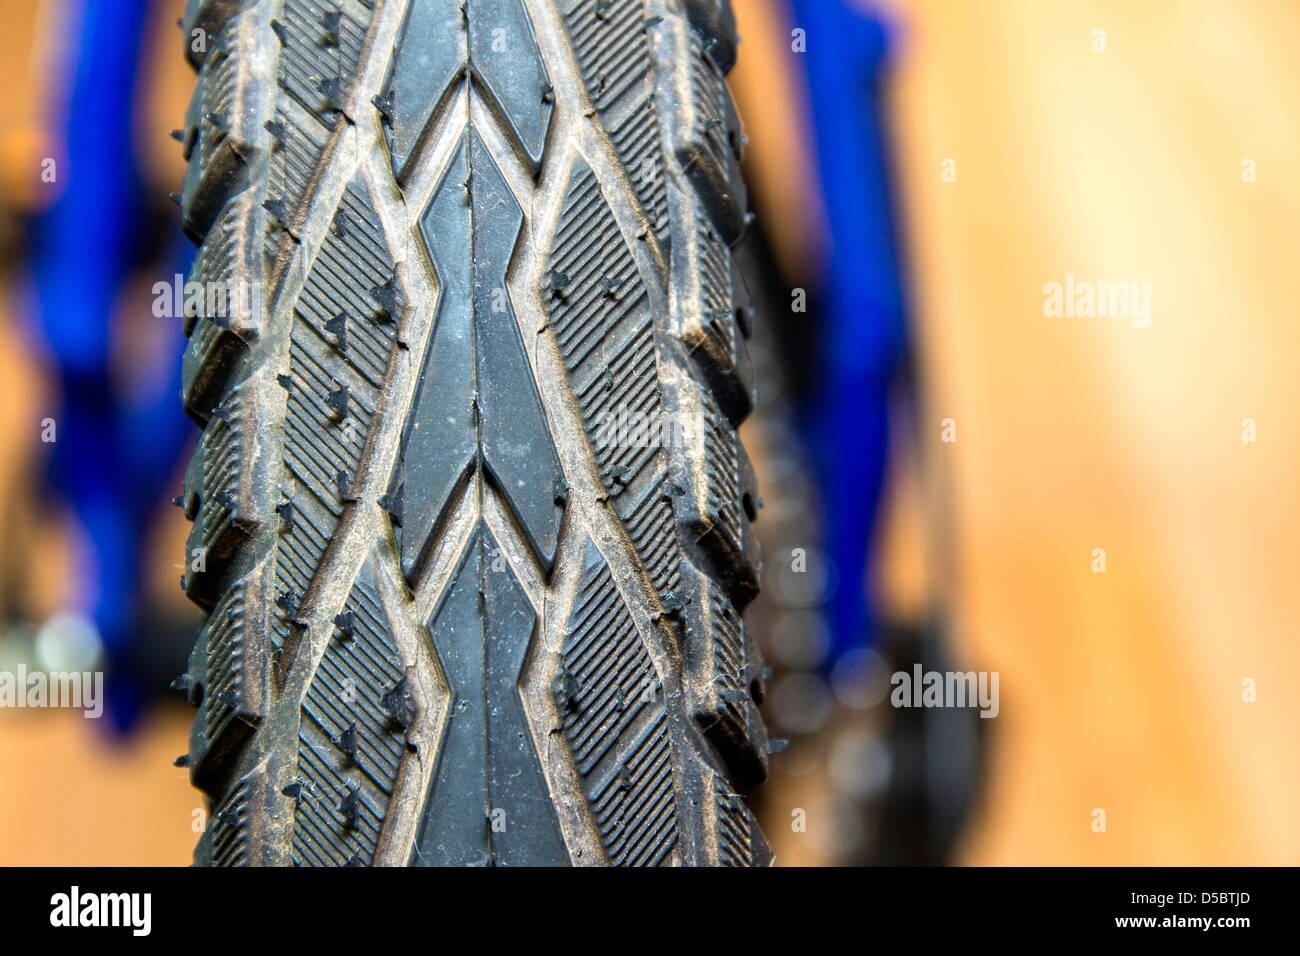 Detail of bicycle wheel close up - Stock Image